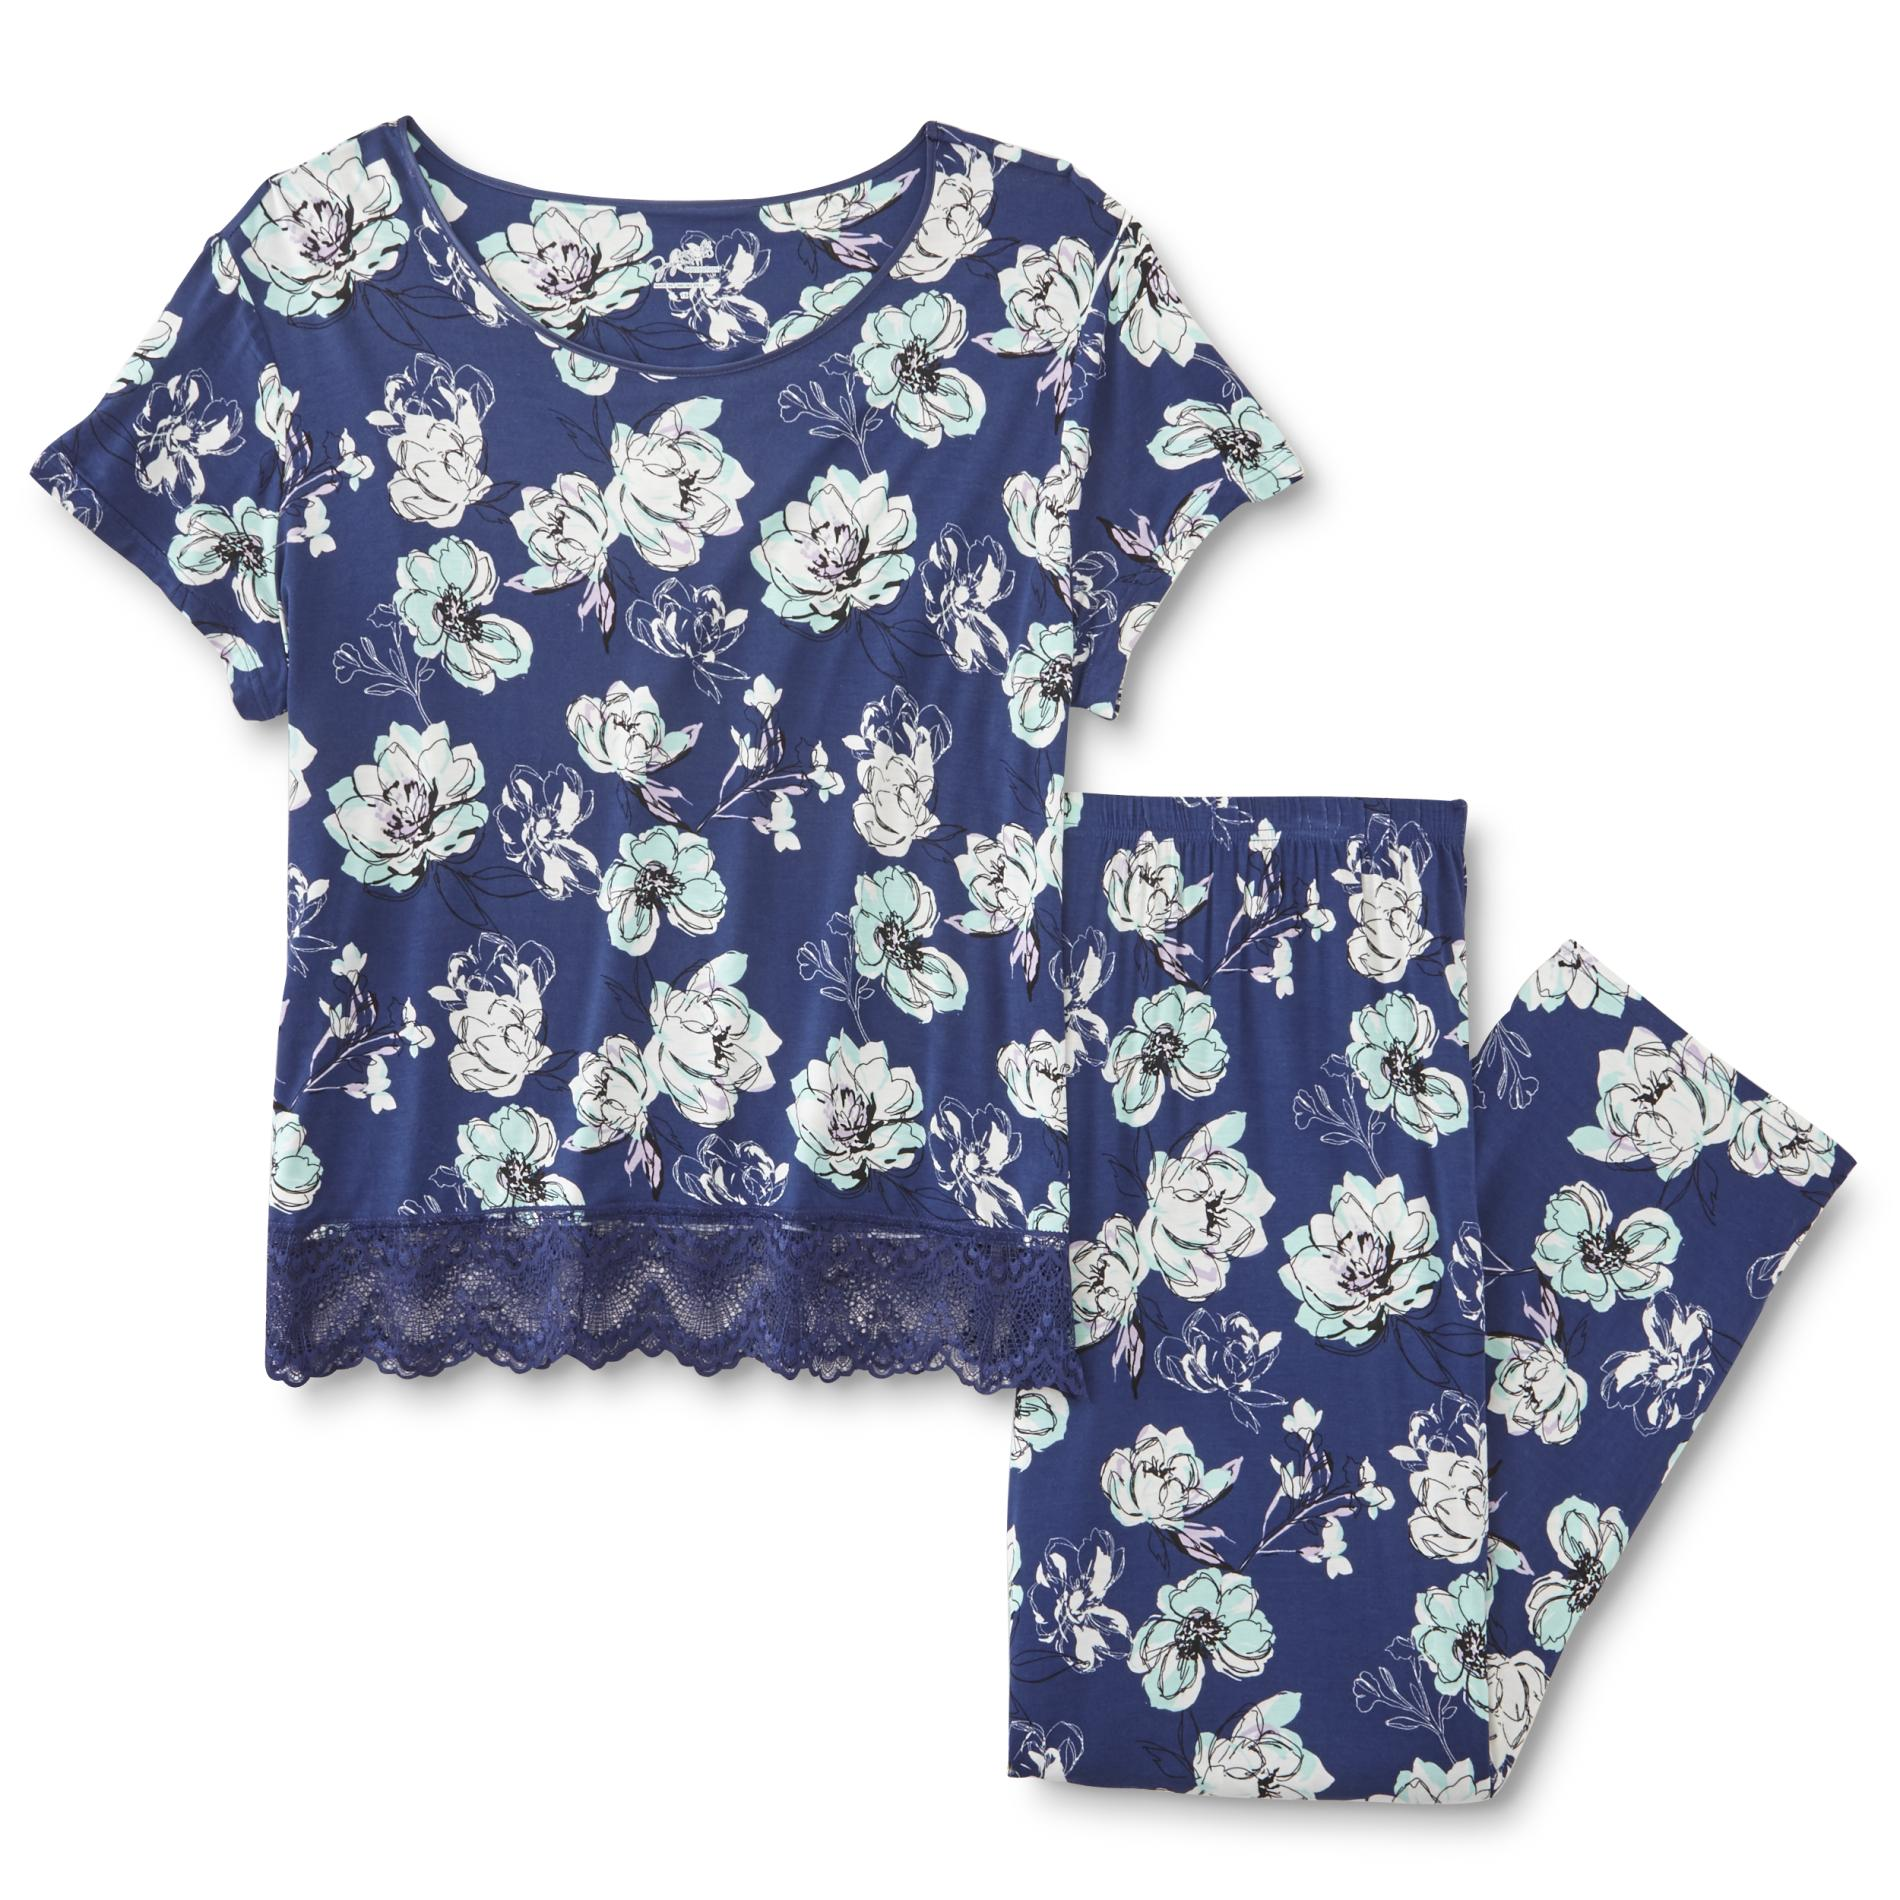 Jaclyn Smith Women' Knit Pajama Shirt & Pants - Floral